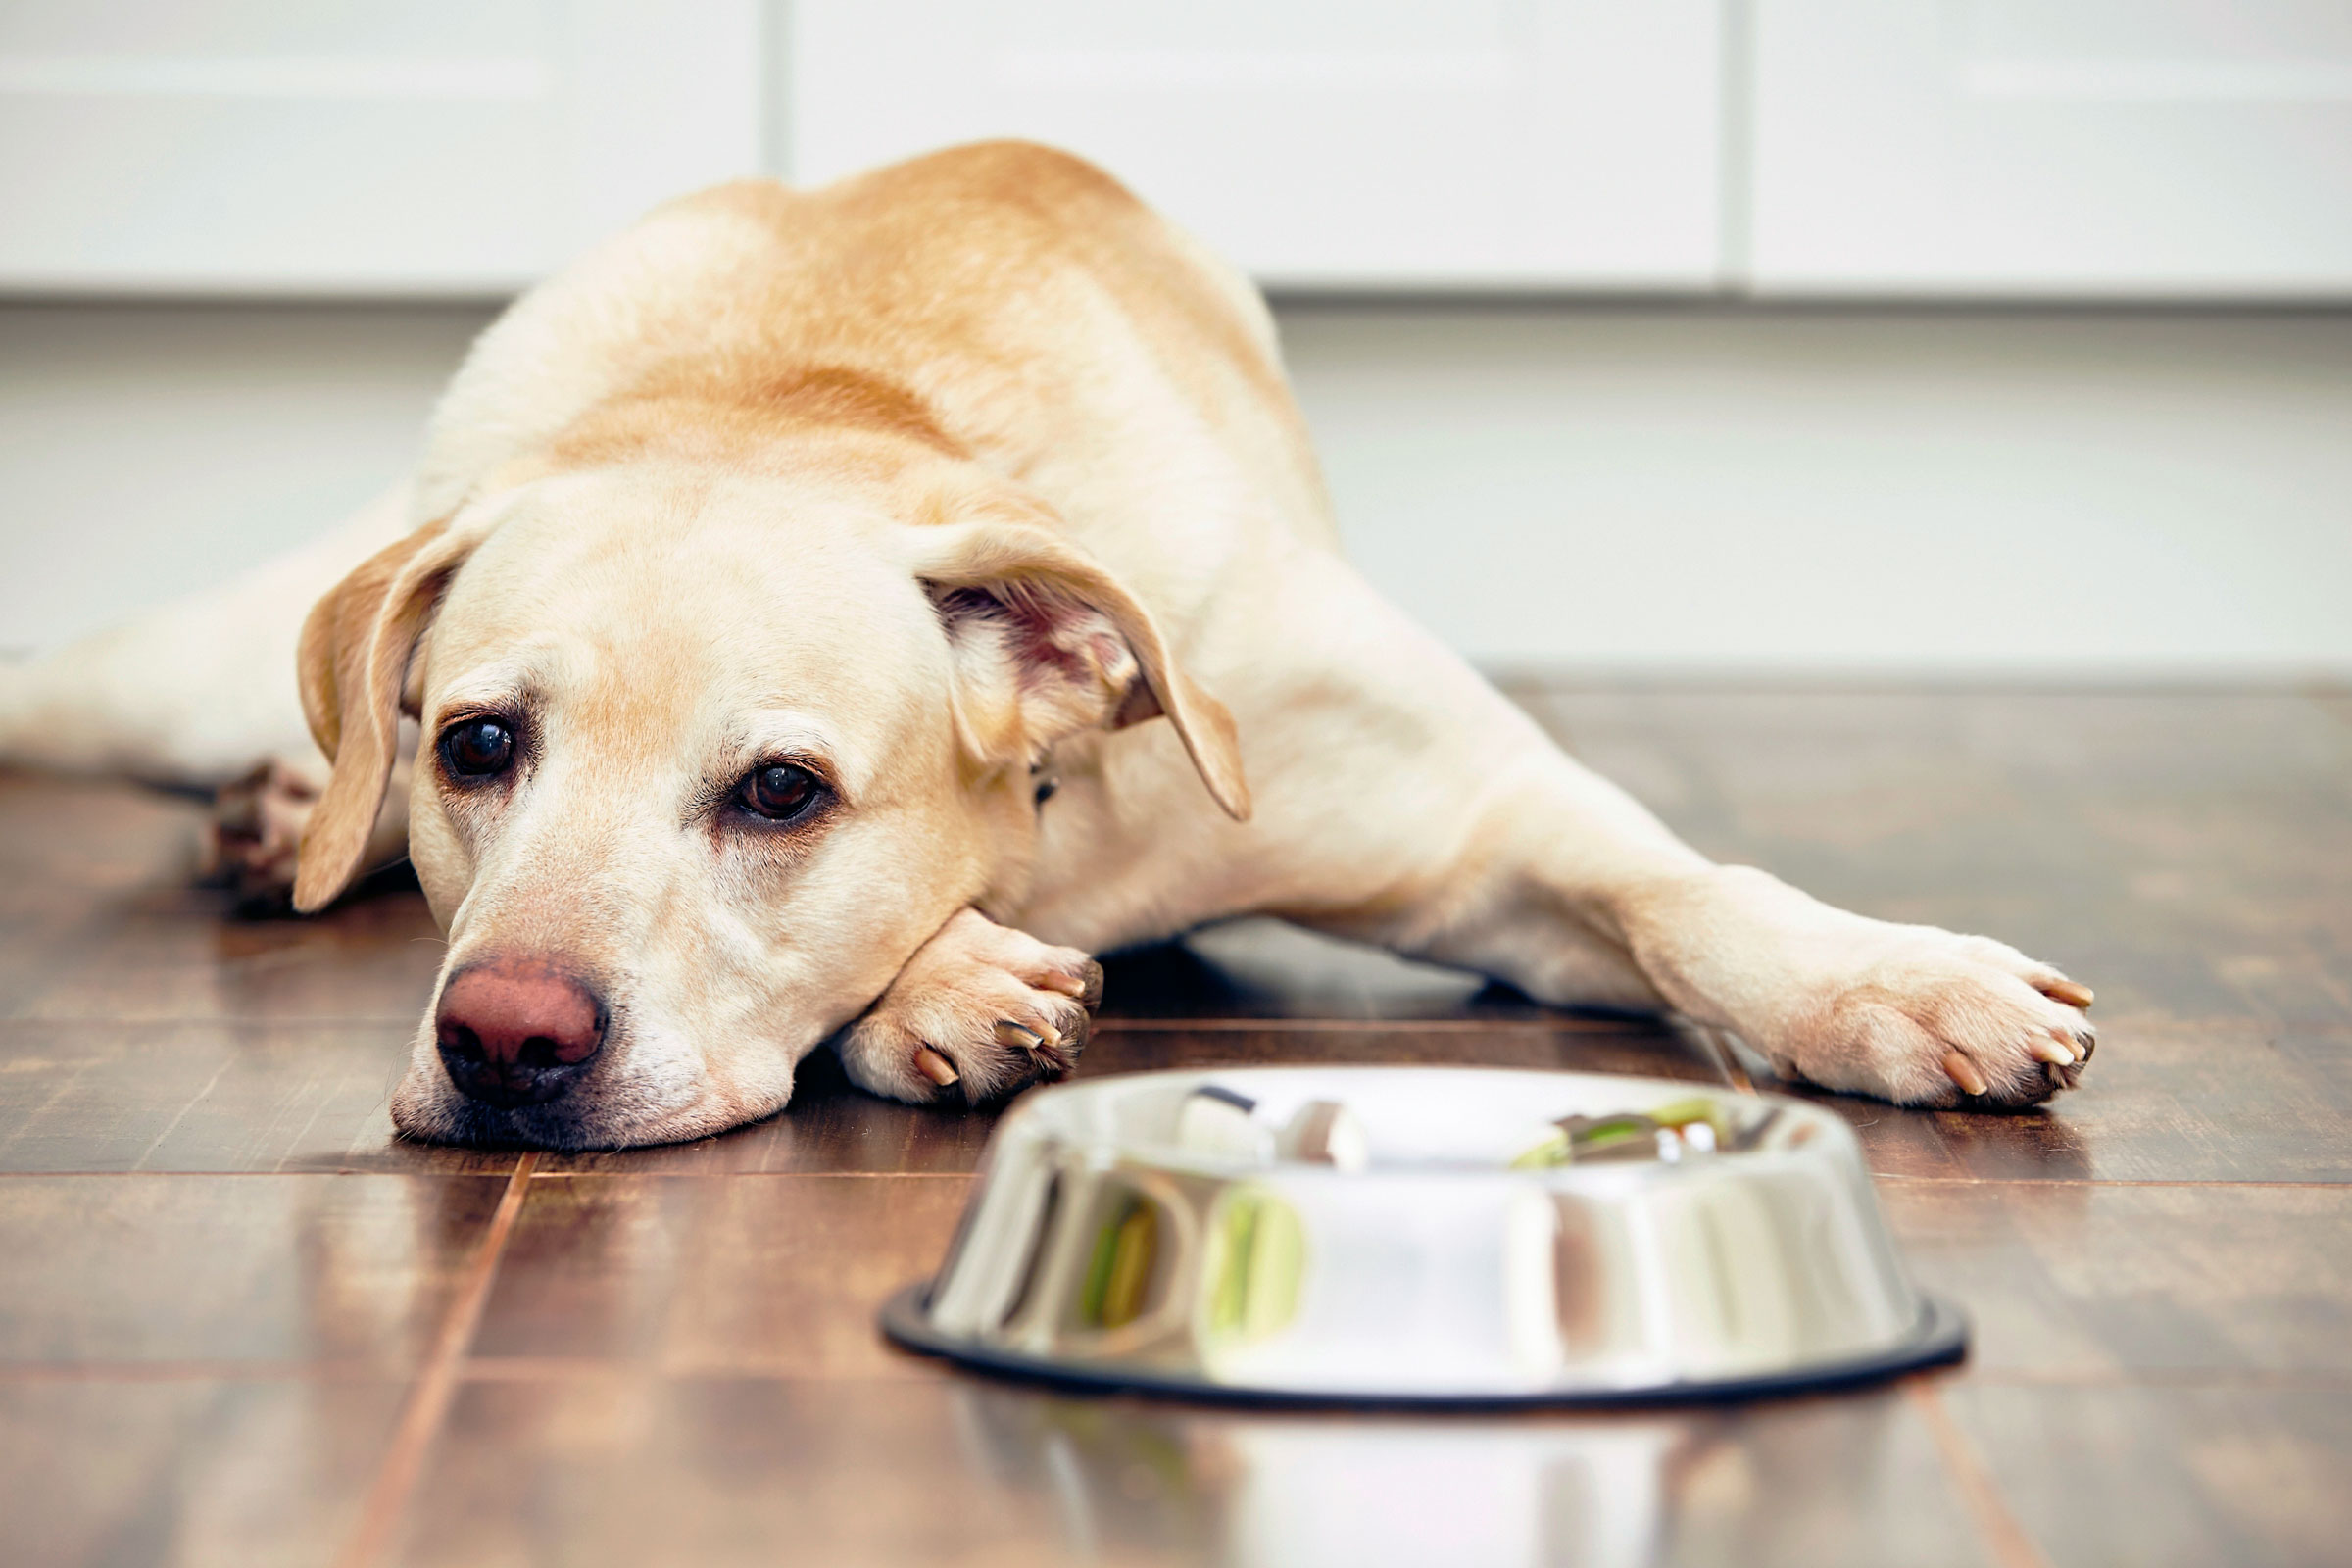 Dogilike.com :: 4 พฤติกรรมน้องหมาพาเพลีย ที่เจ้าของต้องเจอในหน้าร้อนนี้!